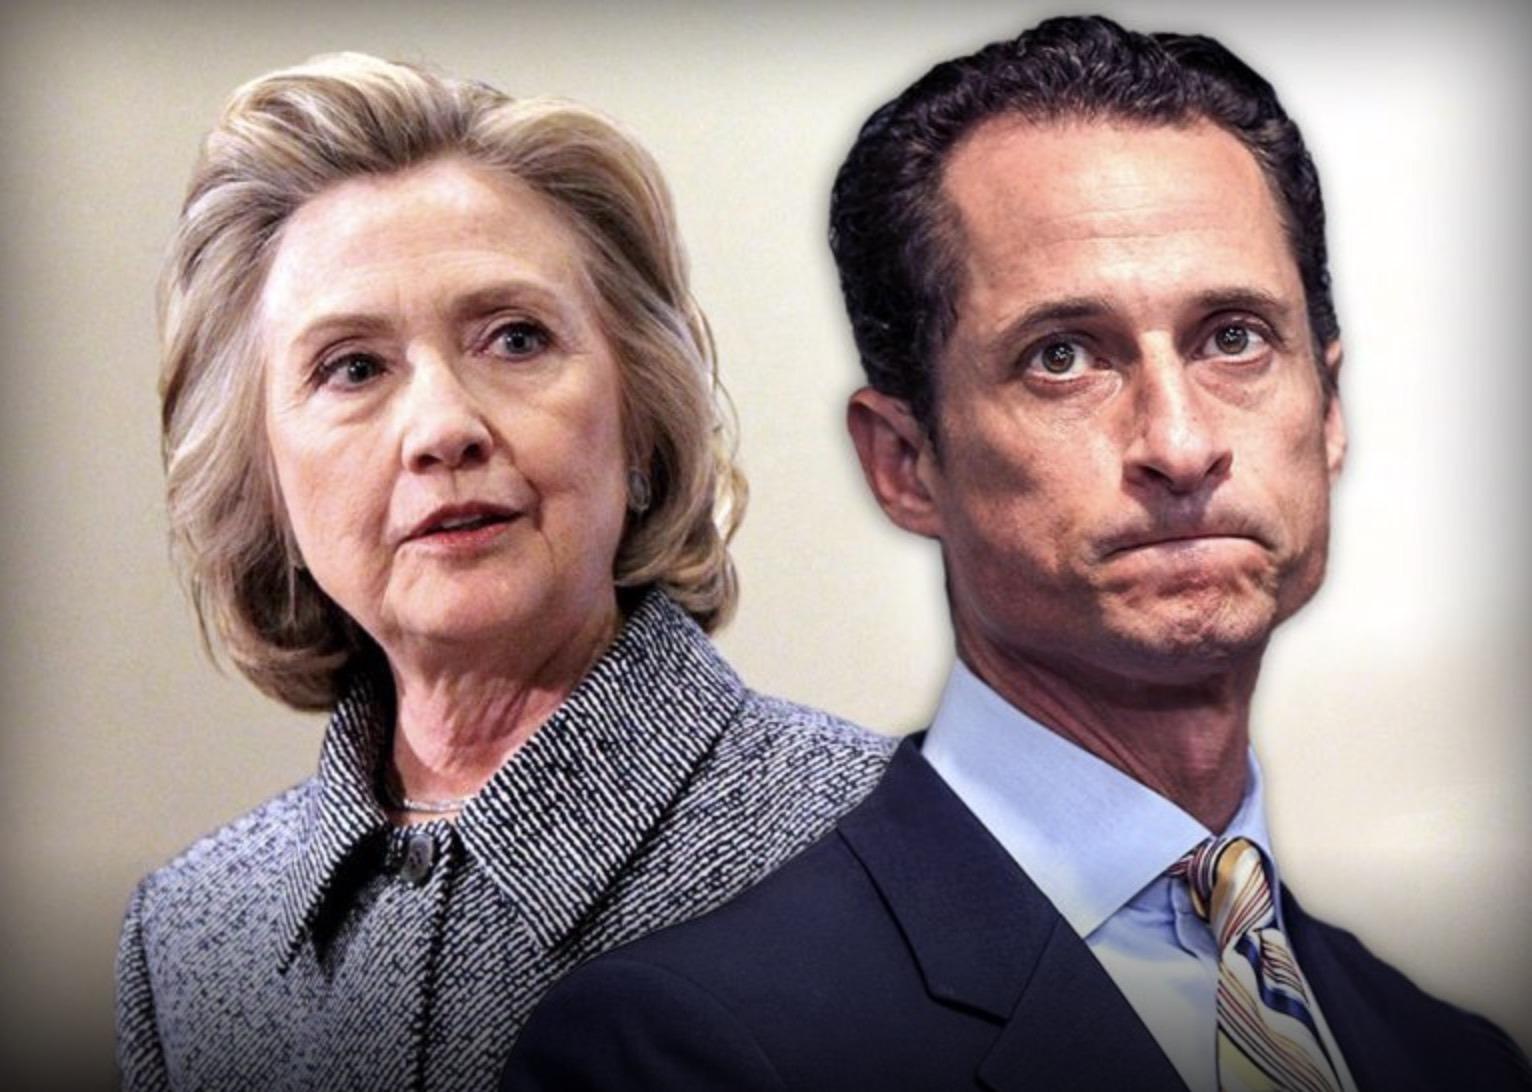 Hillary and Podesta